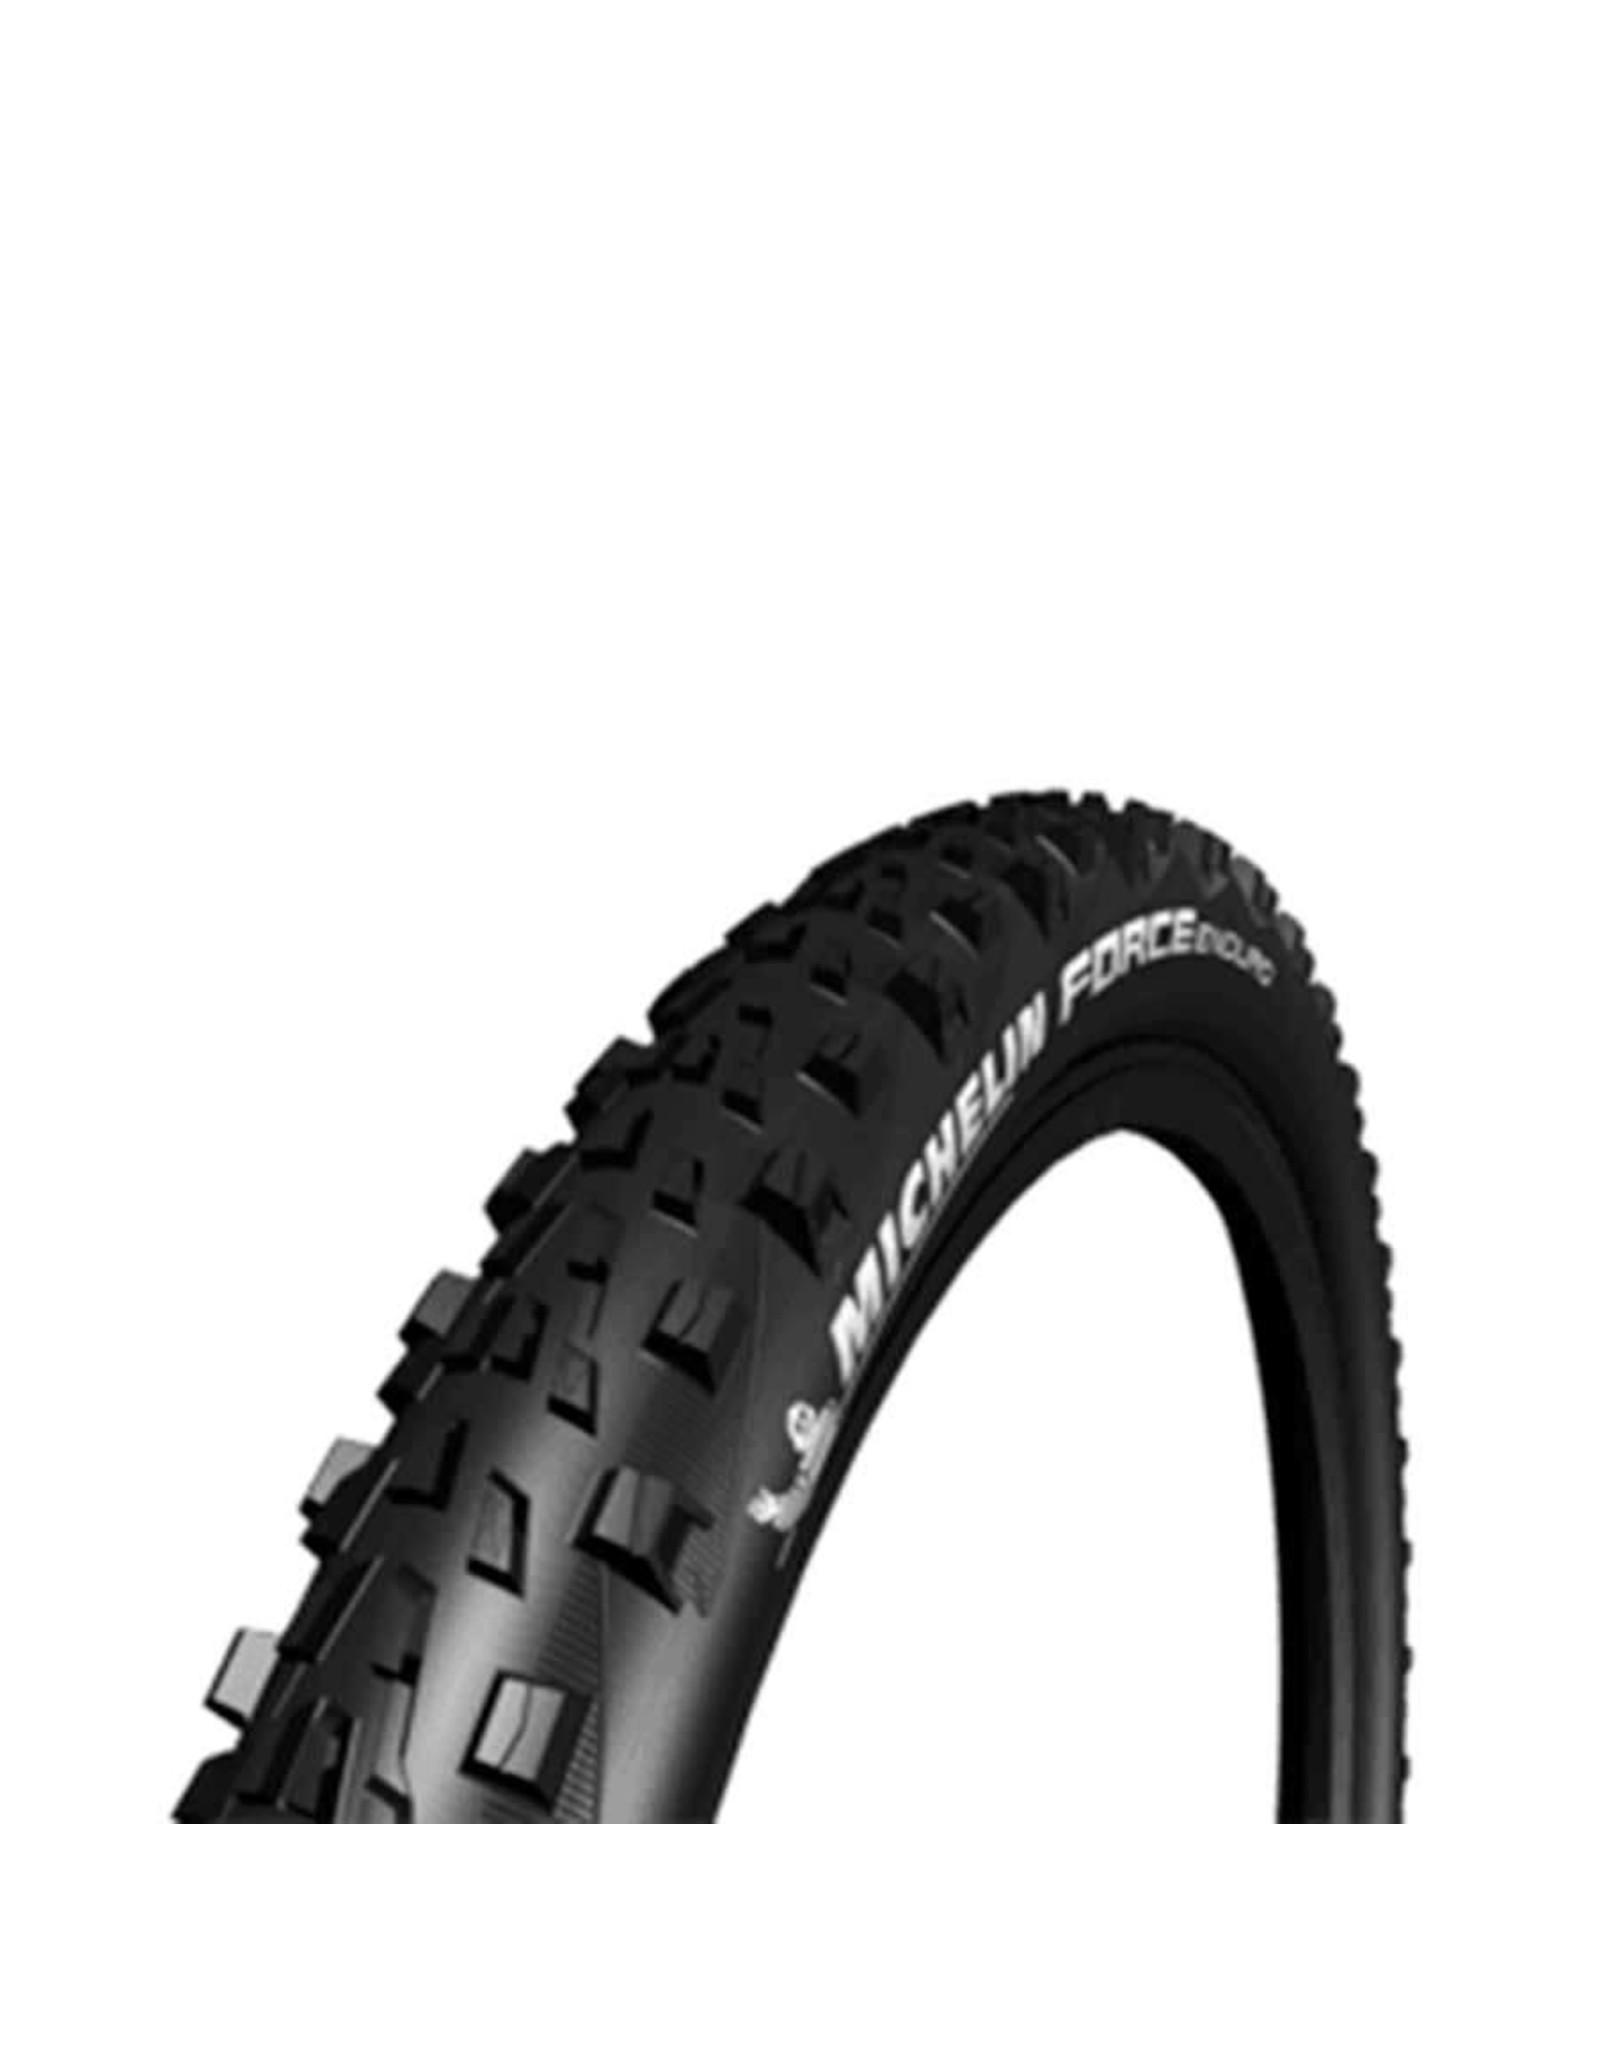 Michelin, Force Enduro, Pneu, 27.5''x2.35, Pliable, Tubeless Ready, GUM-X, GravityShield, 60TPI, Noir